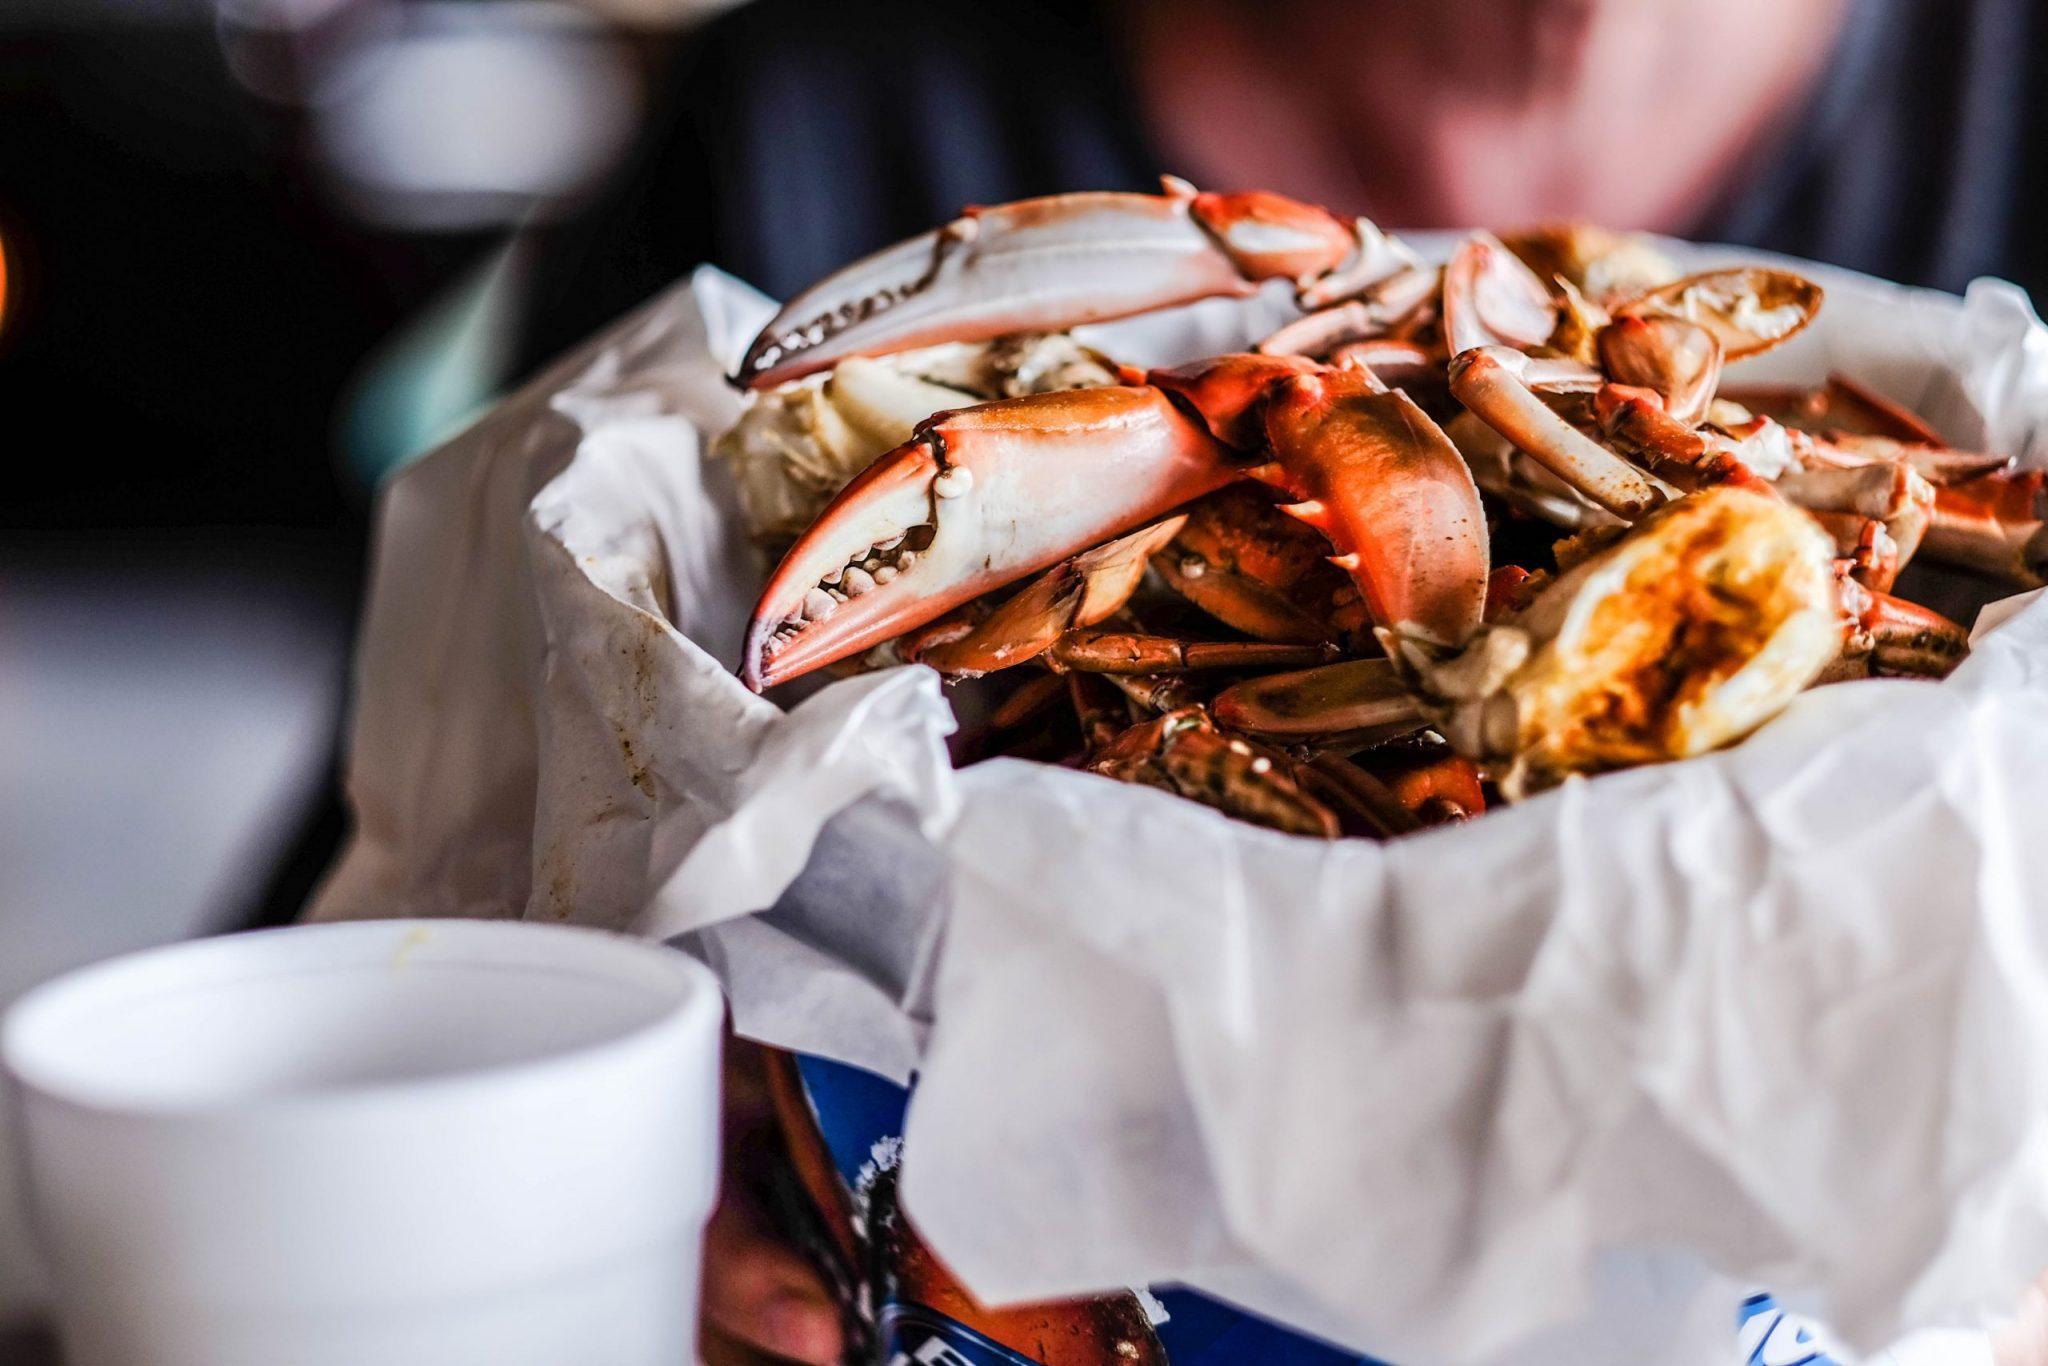 Crabs from Sunbury Crab Company